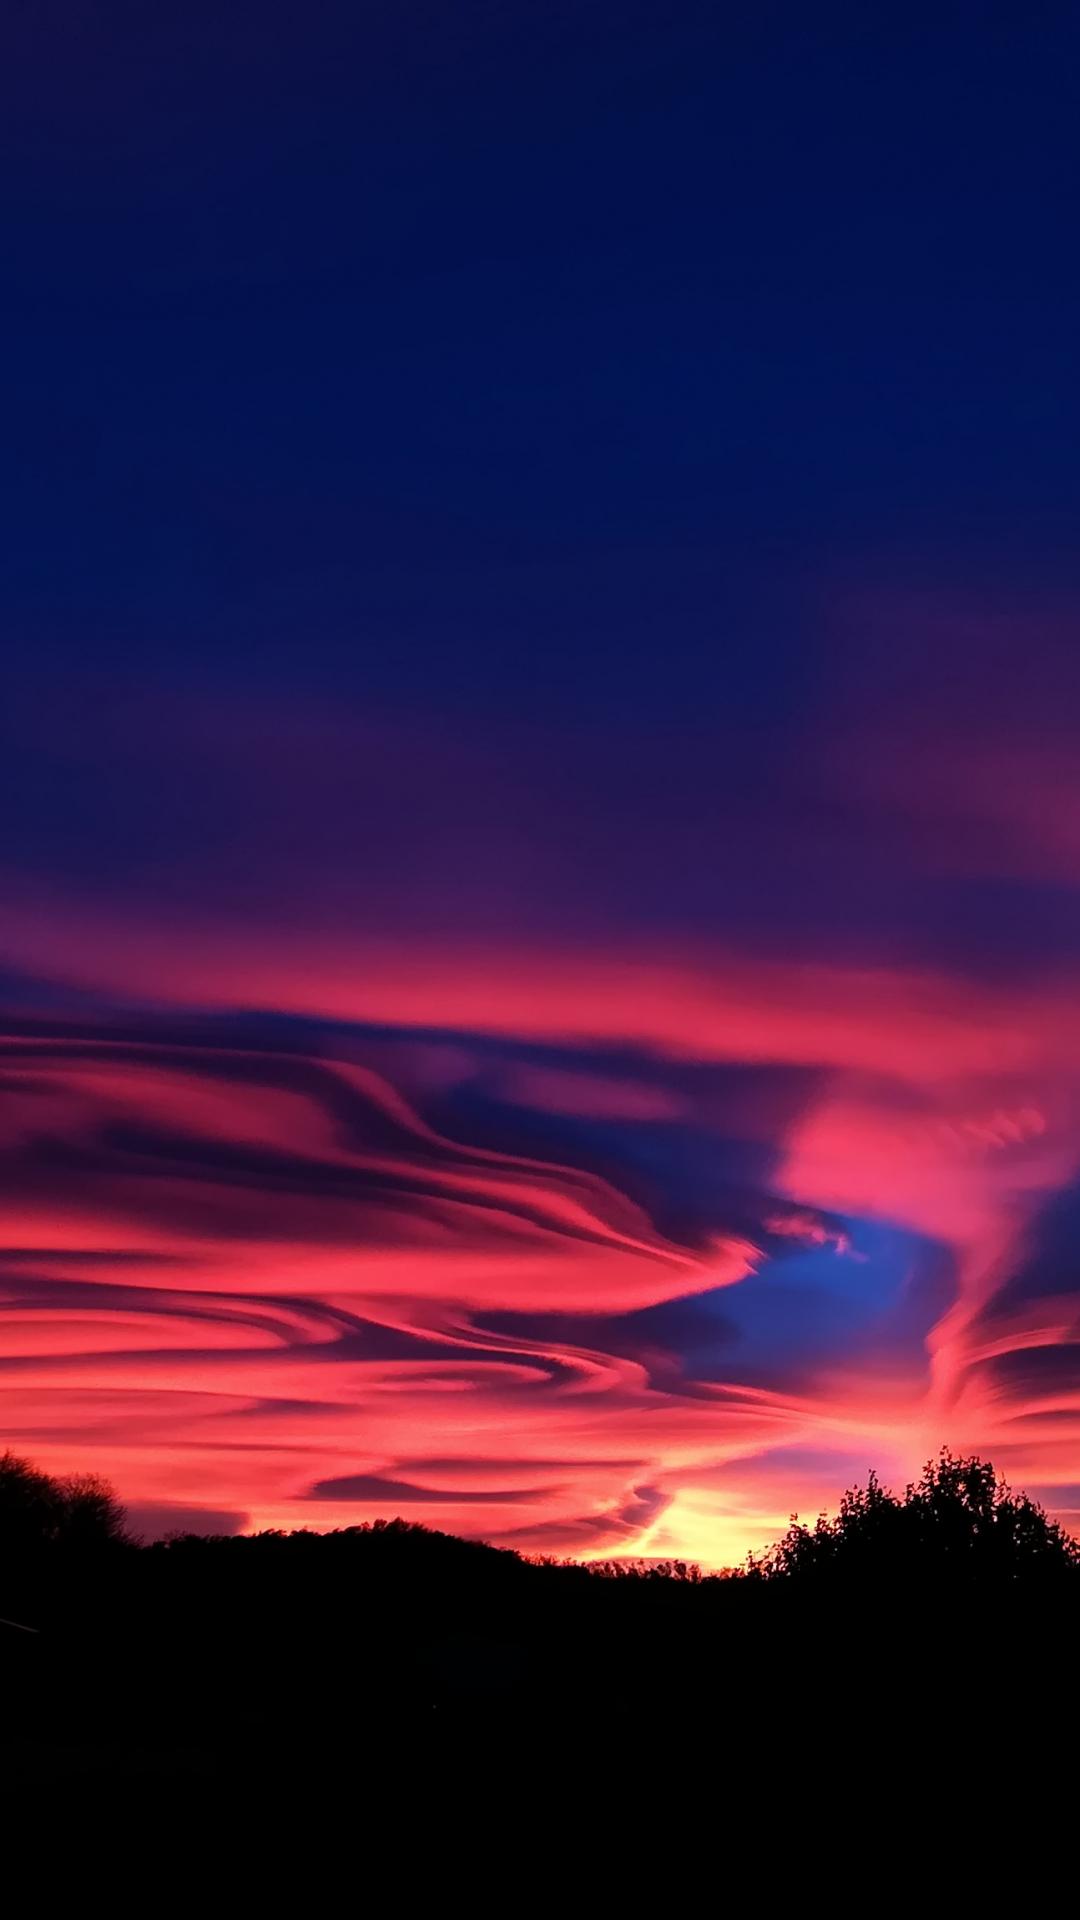 Sunset Clouds iPhone Wallpaper